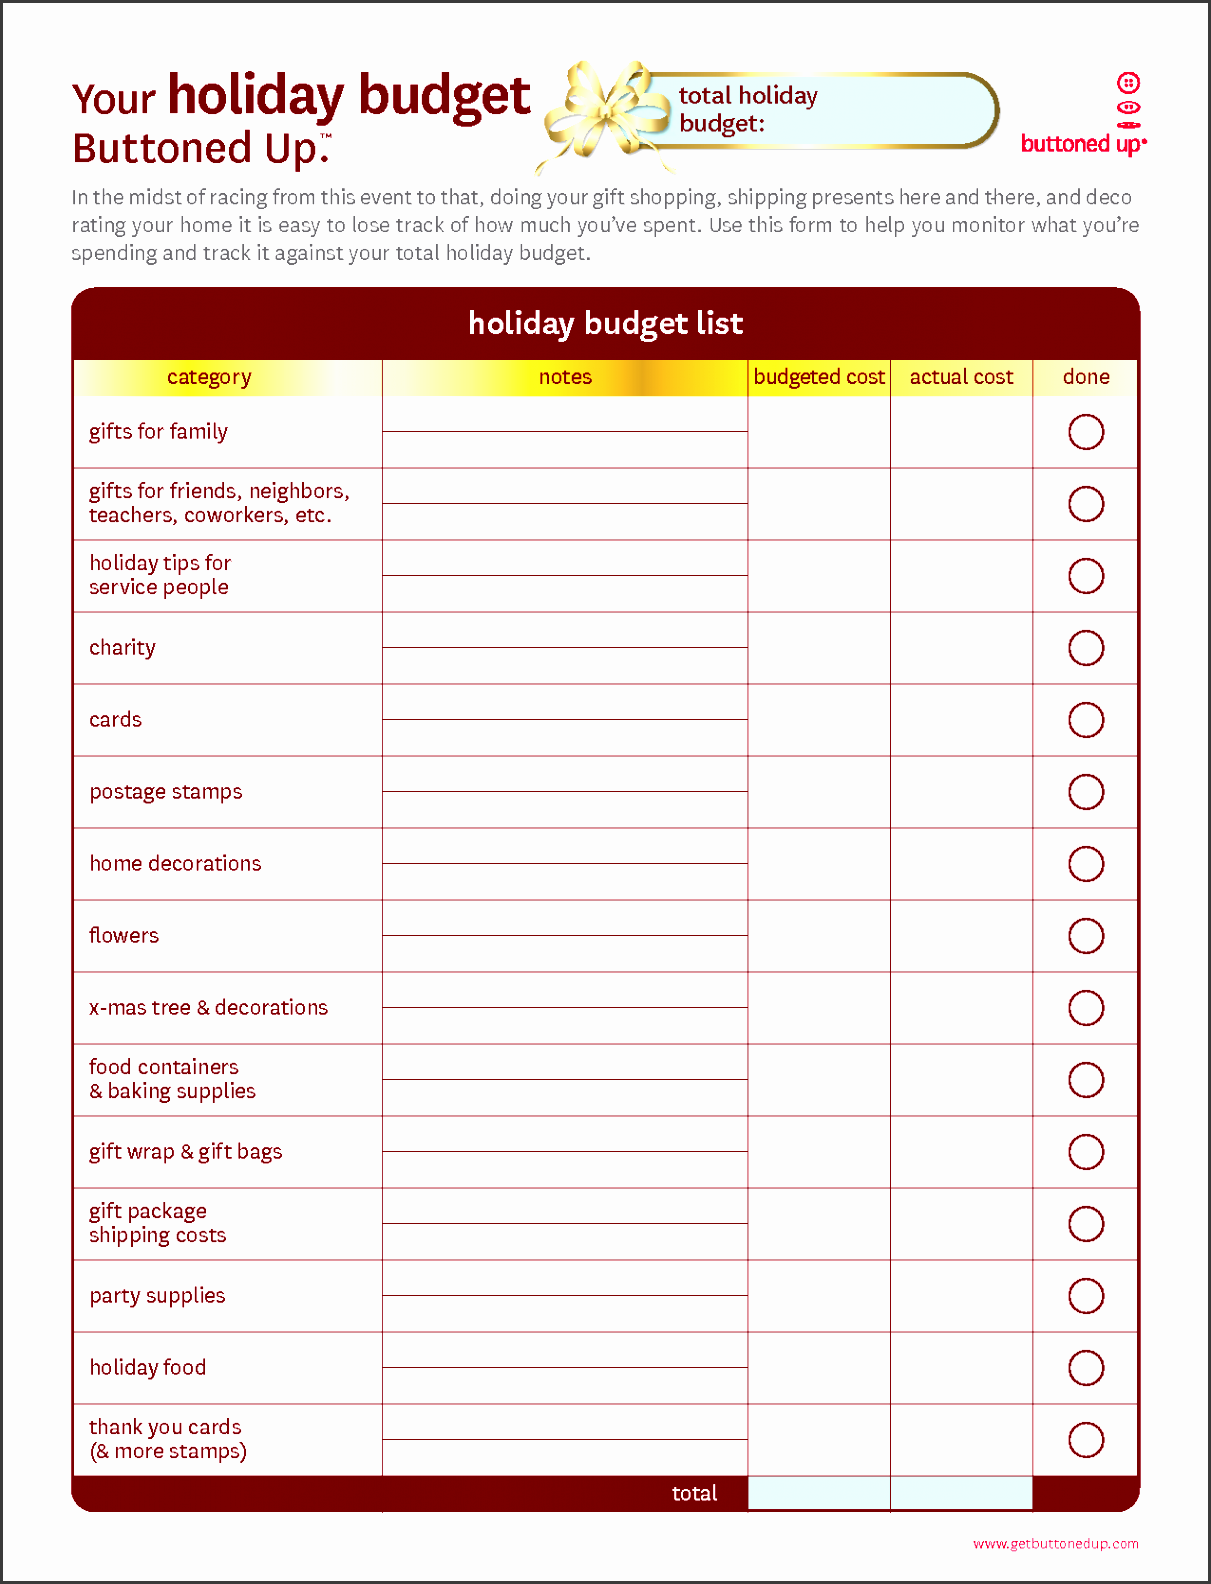 free printable personal bud worksheet free printable holiday organization bud form template pdf